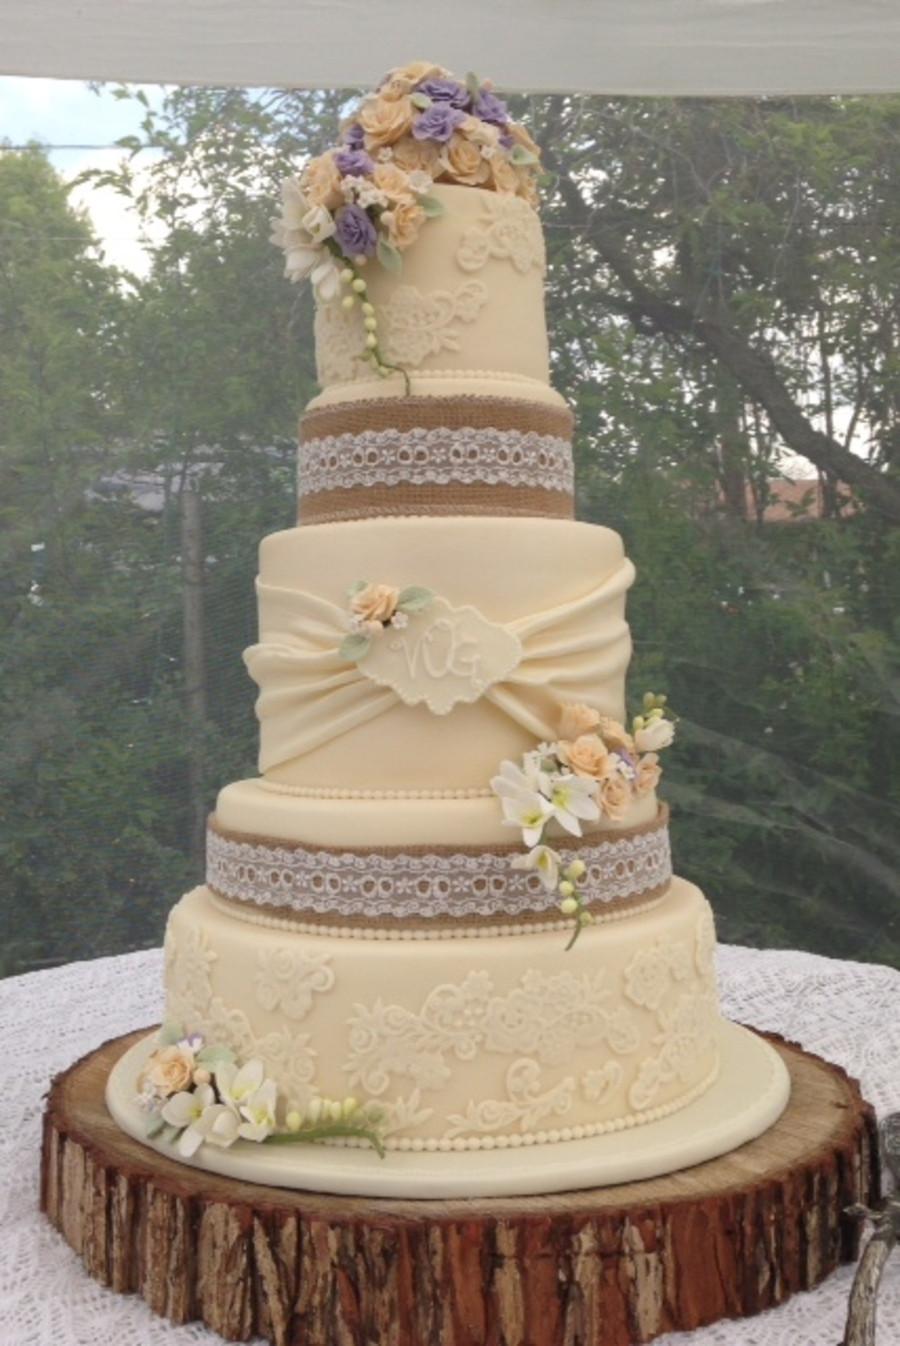 Vintage Wedding Cakes Ideas  Vintage Rustic Wedding Cake CakeCentral